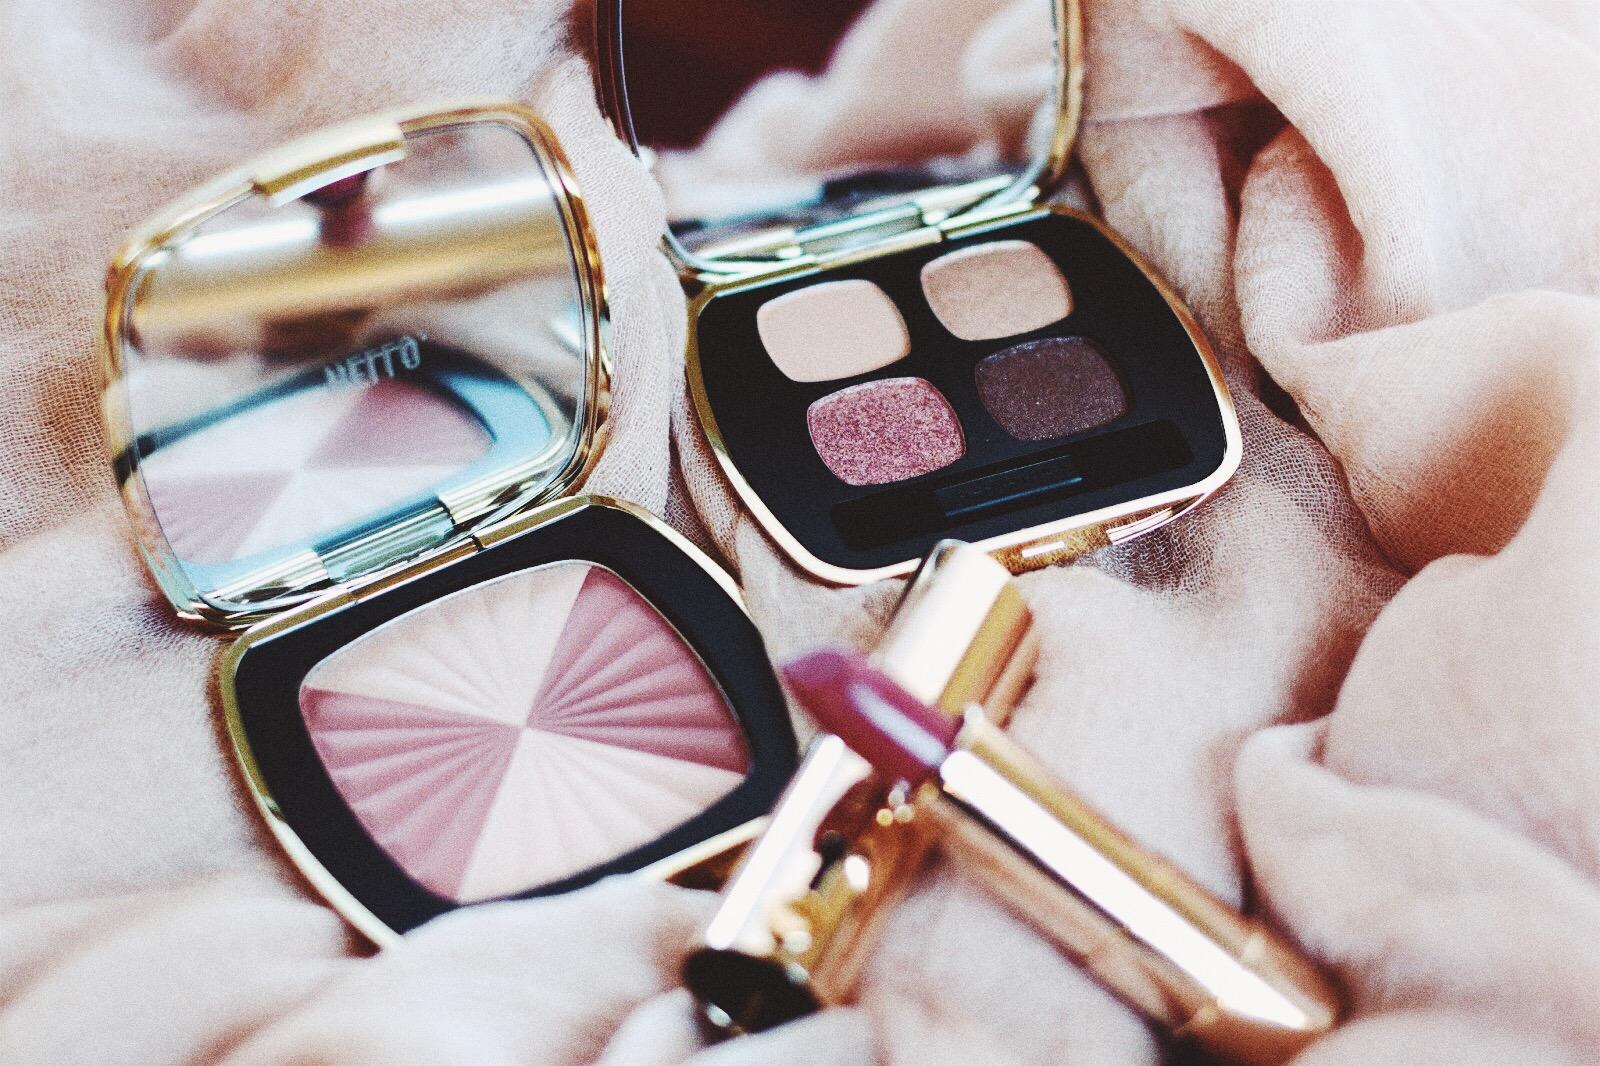 bareminerals collection maquillage printemps 2016 lovescape